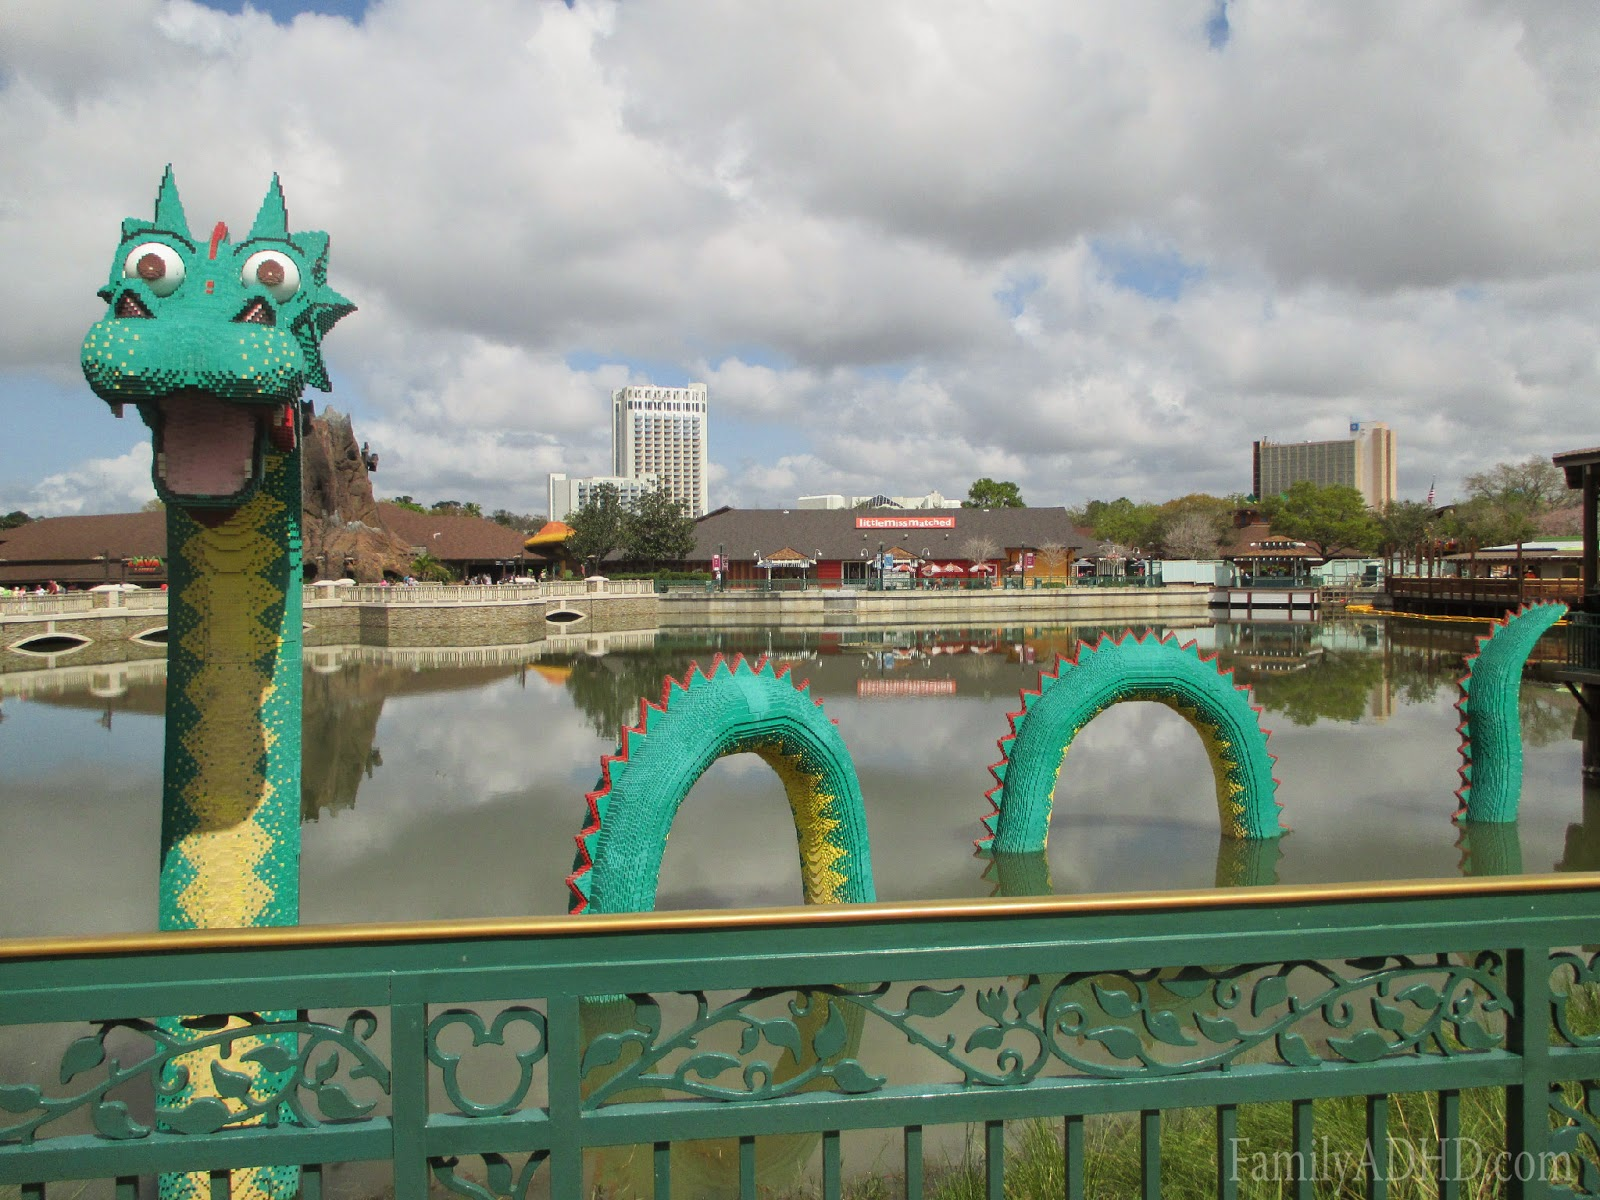 orlando family travel downtown disney travel blog review